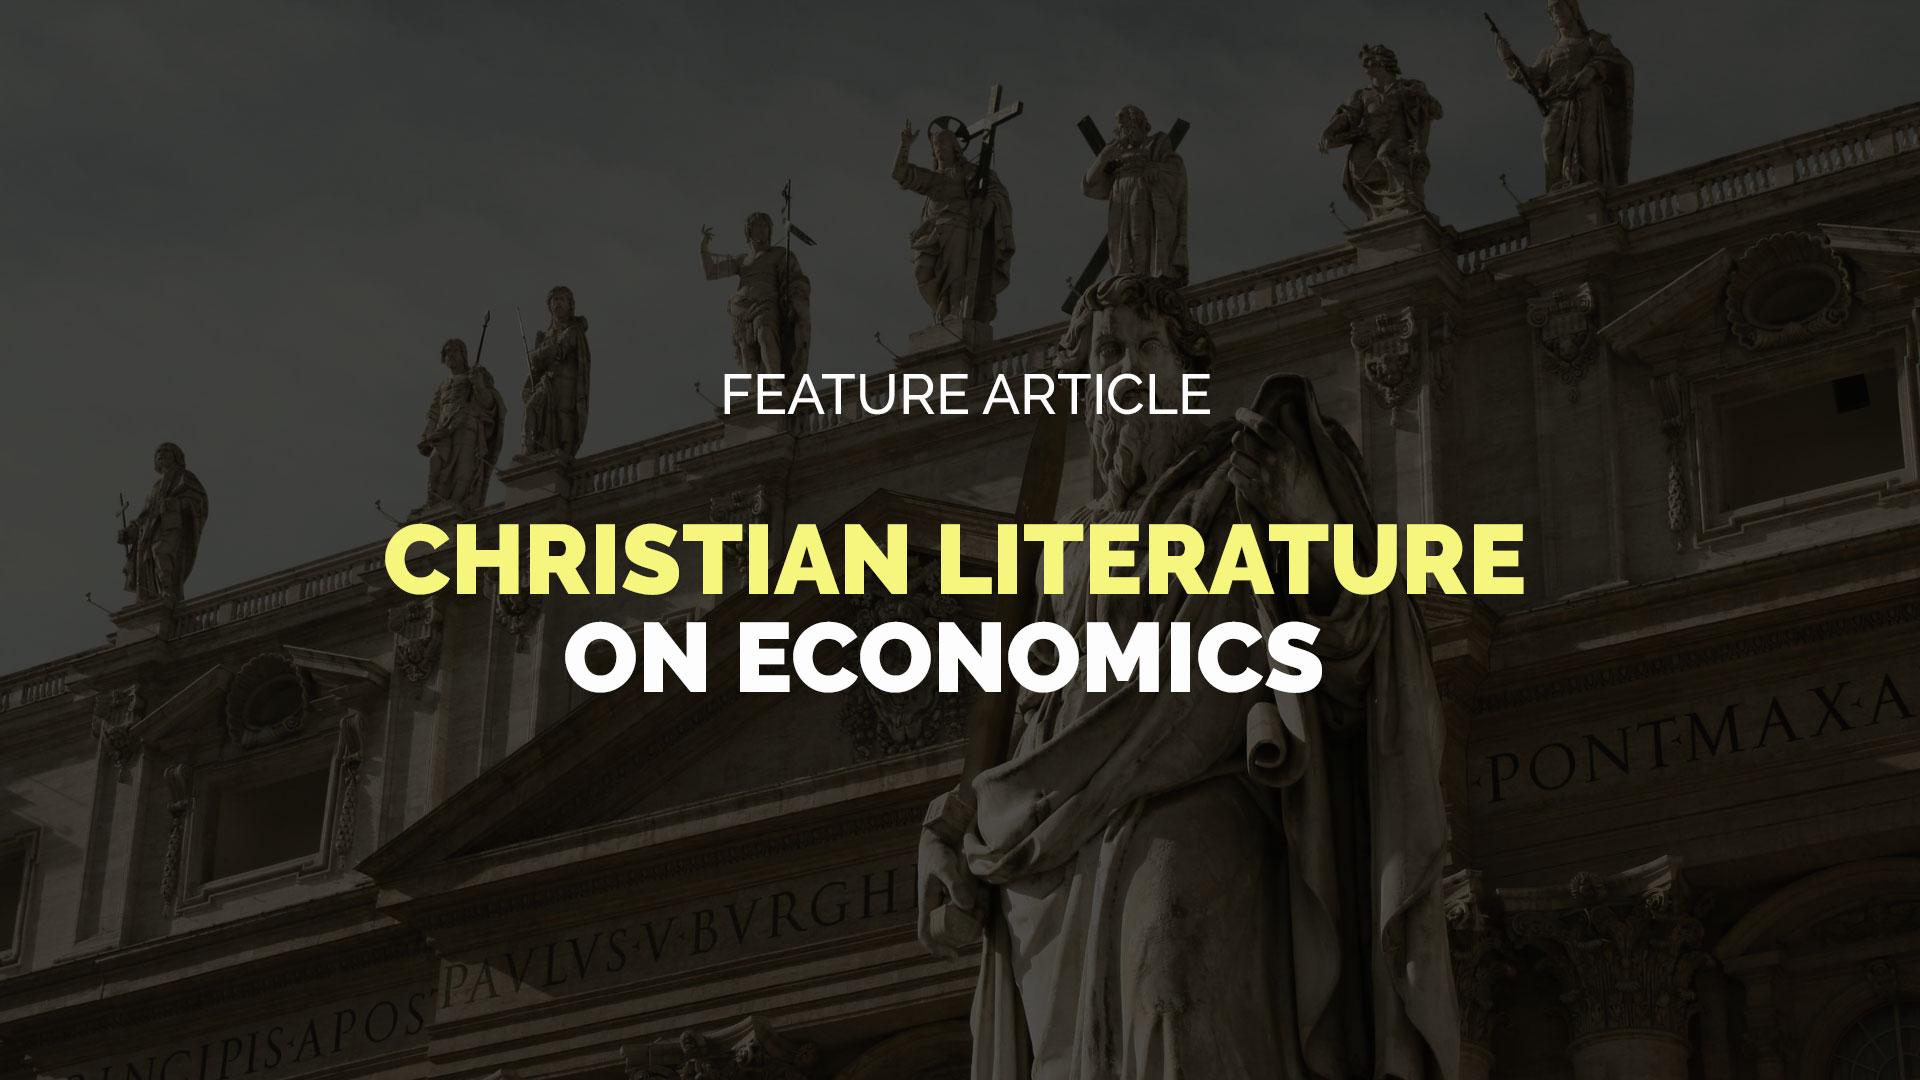 Christian-Literature-on-Economics banner